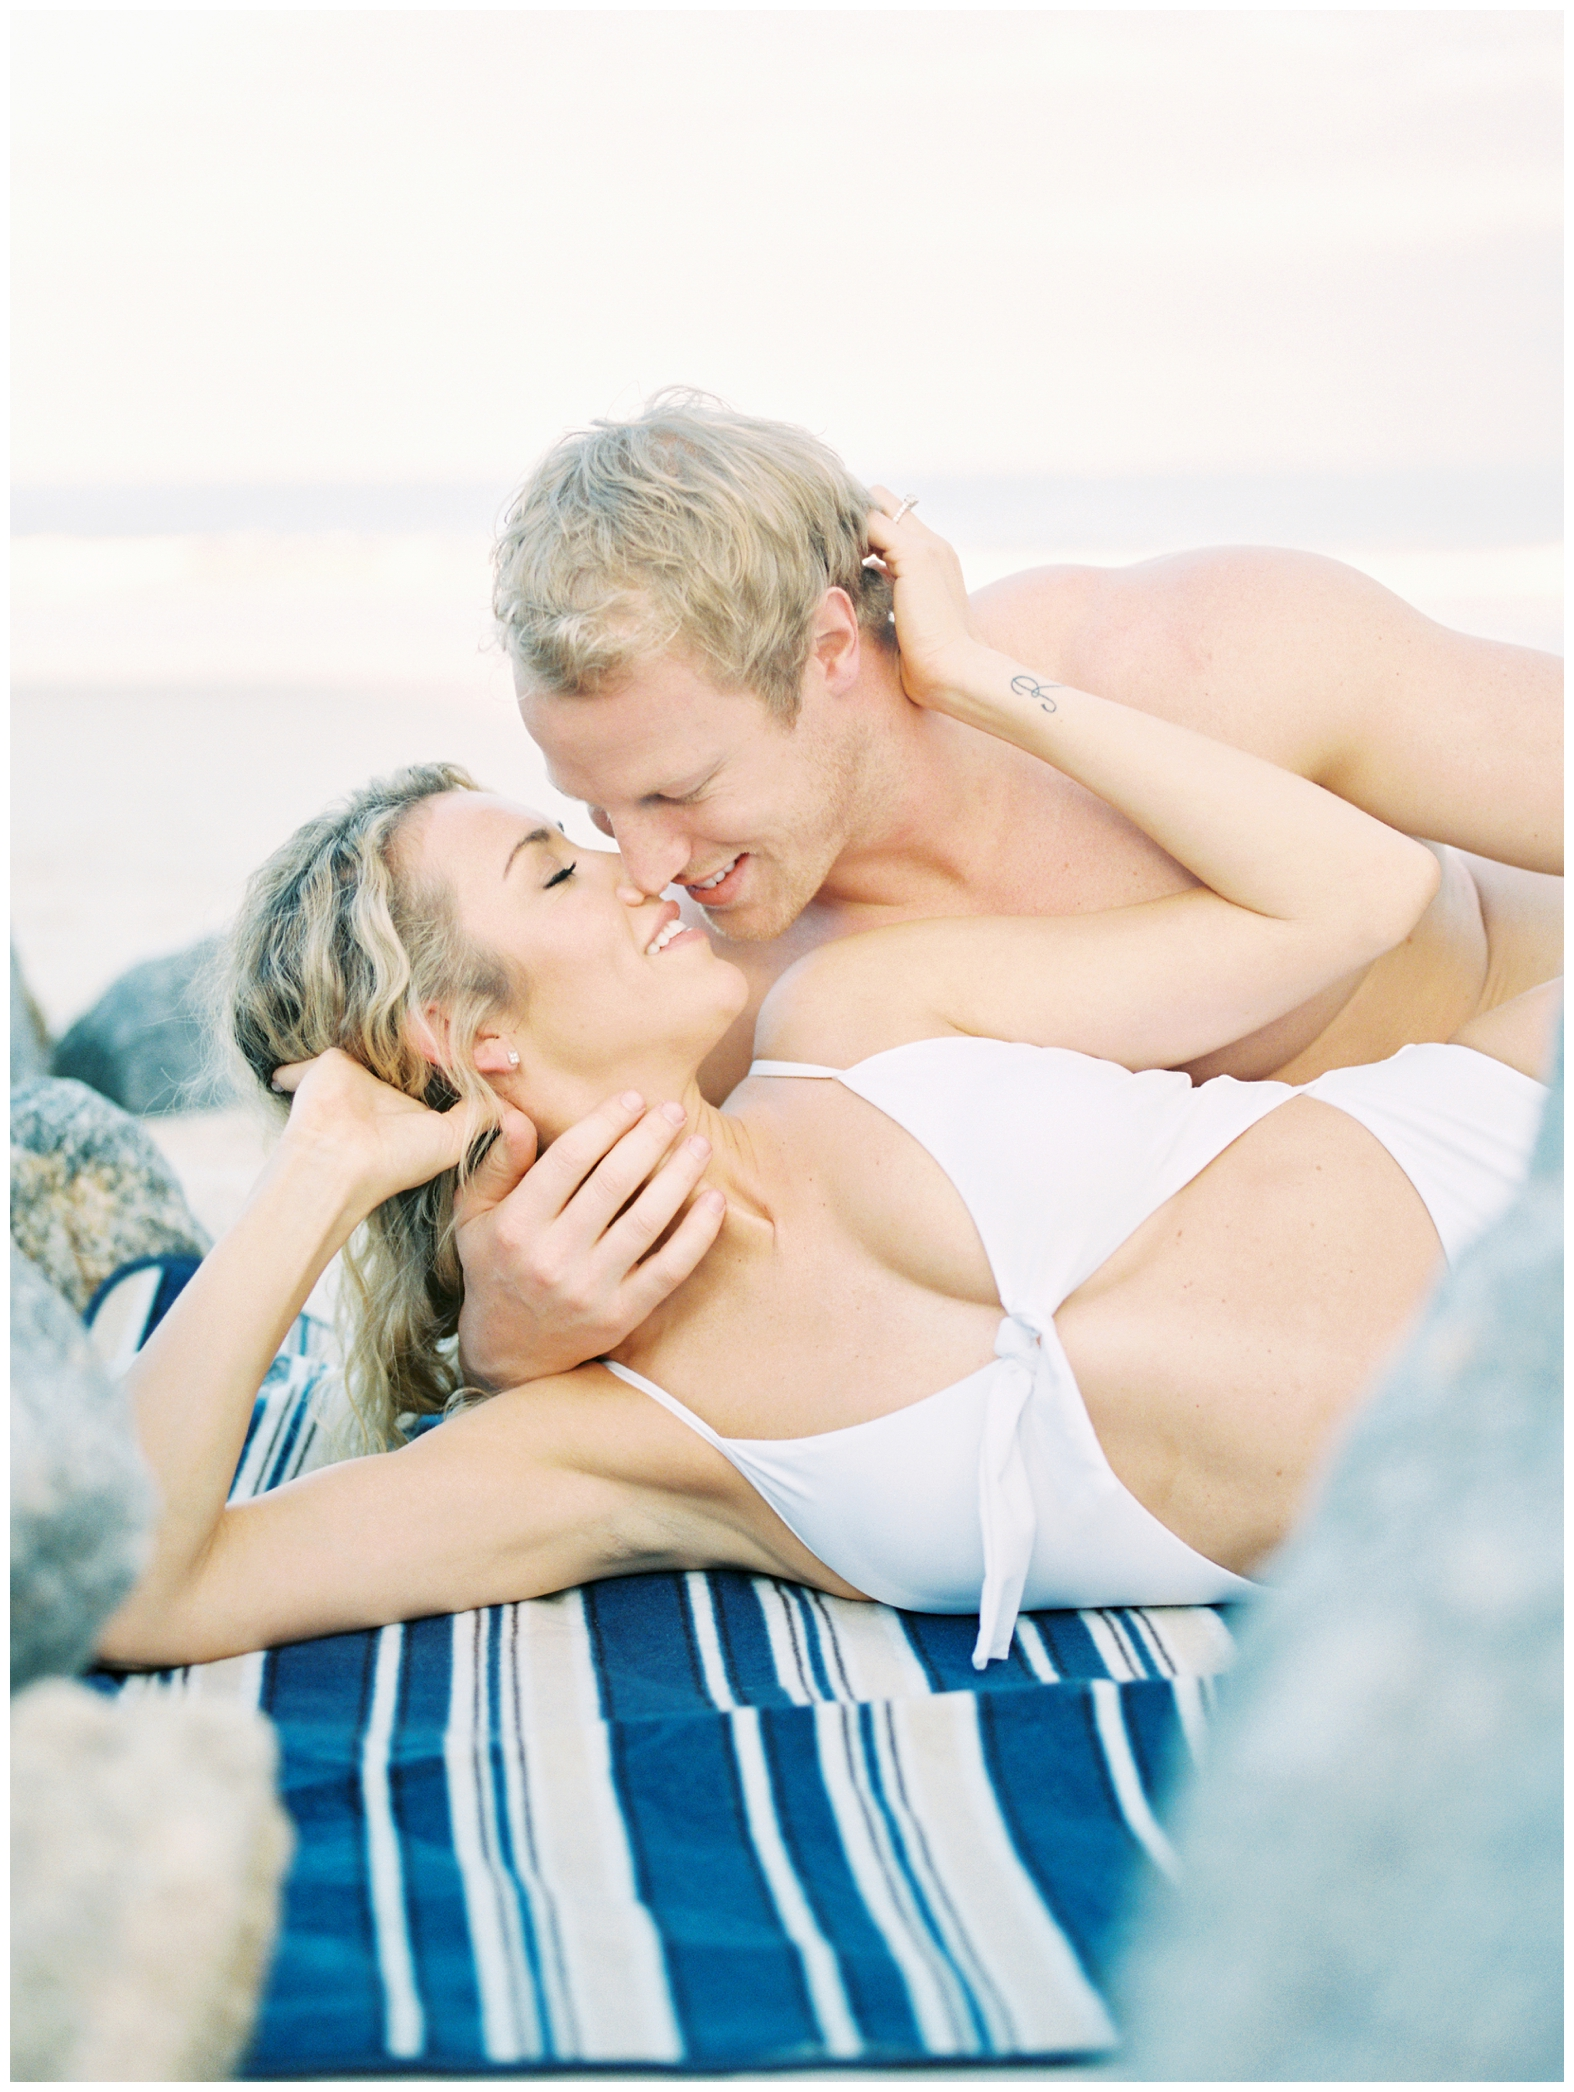 Lisa Silva Photography -Beachy Lifestyle Engagement Session in Palm Coast Florida - Jacksonville Film Photograpgers_0020.jpg